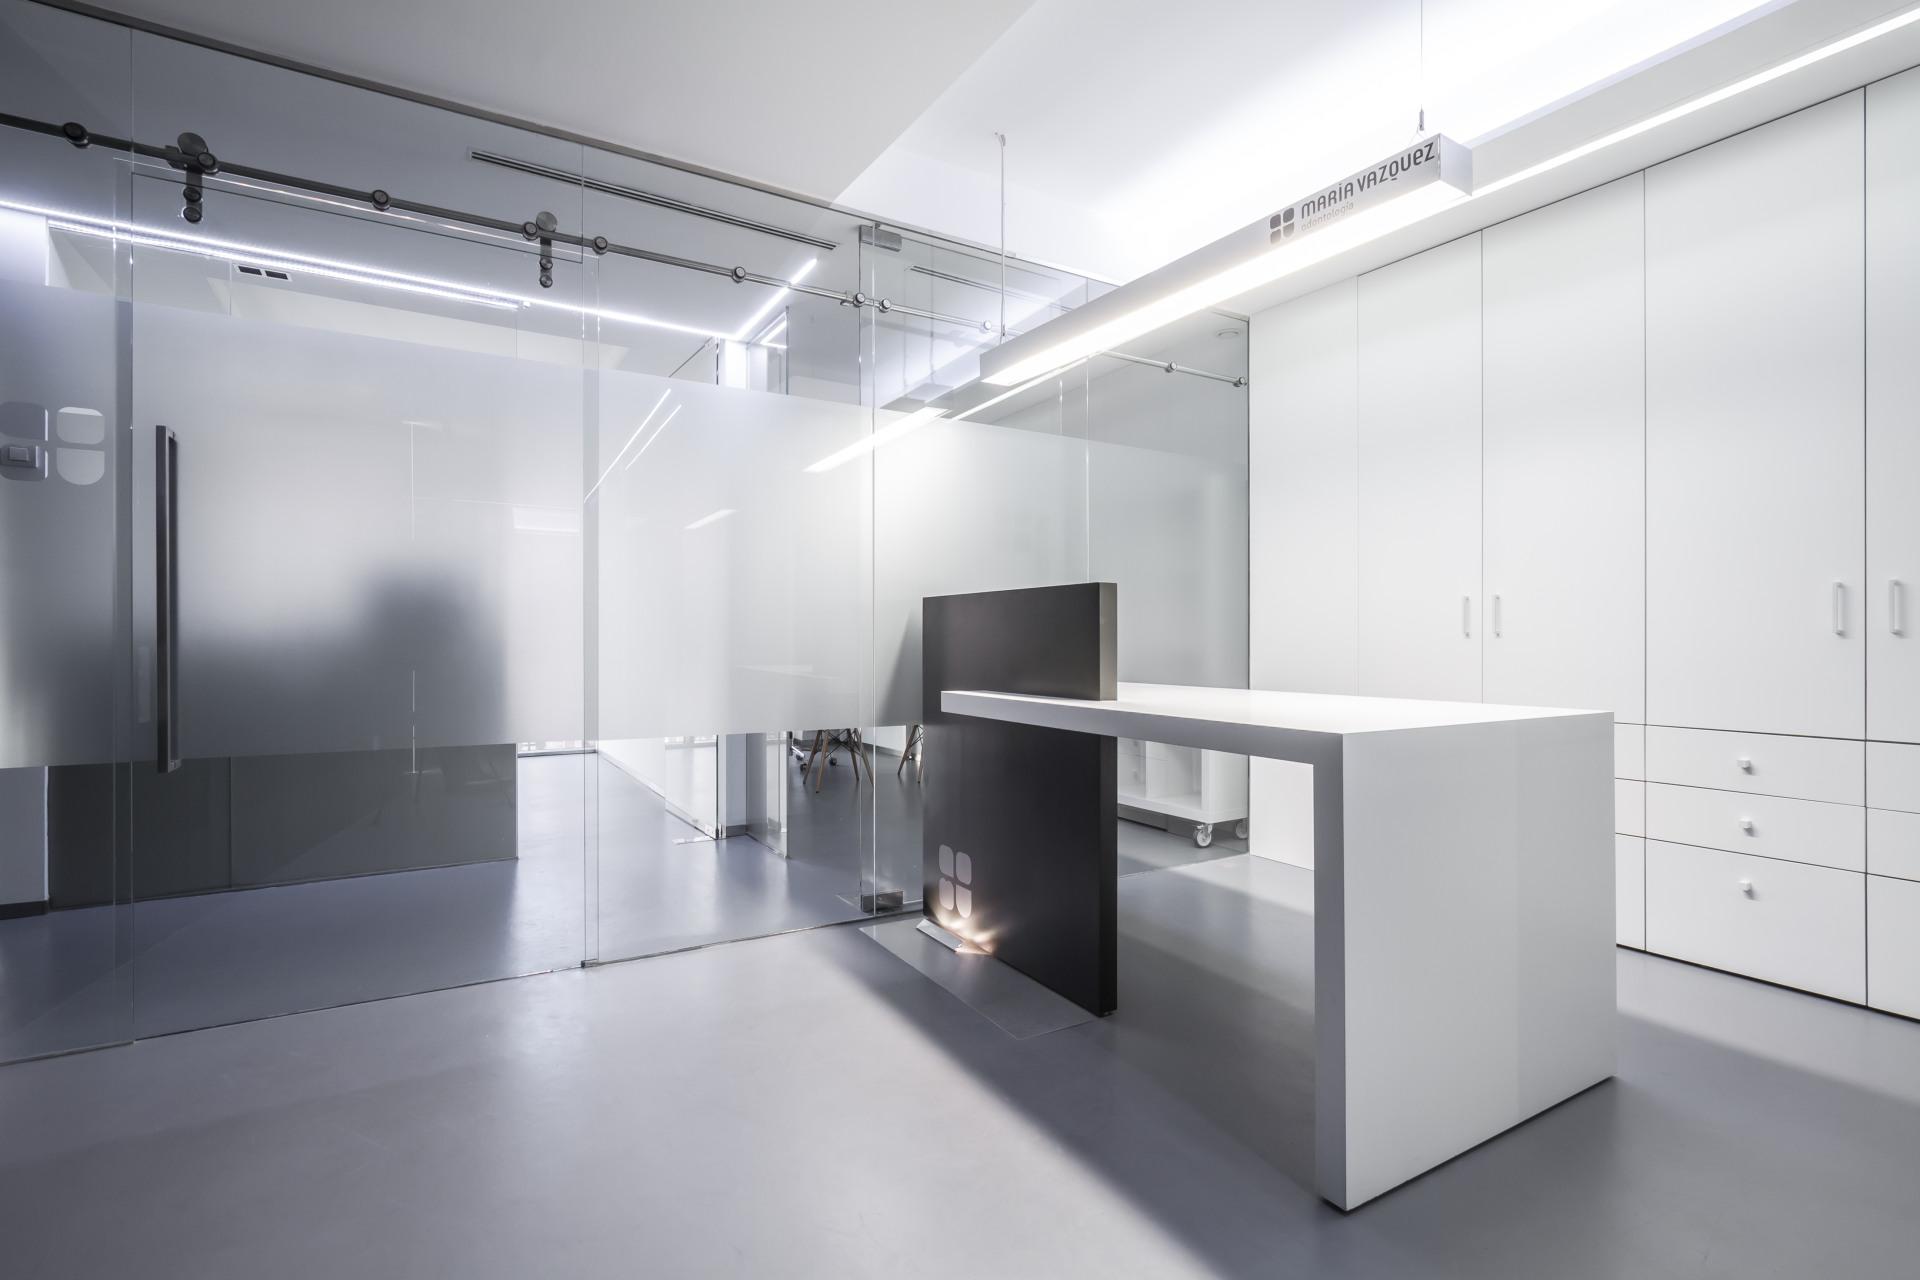 fotografia-arquitectura-valencia-german-cabo-hernandez-clinica (9)